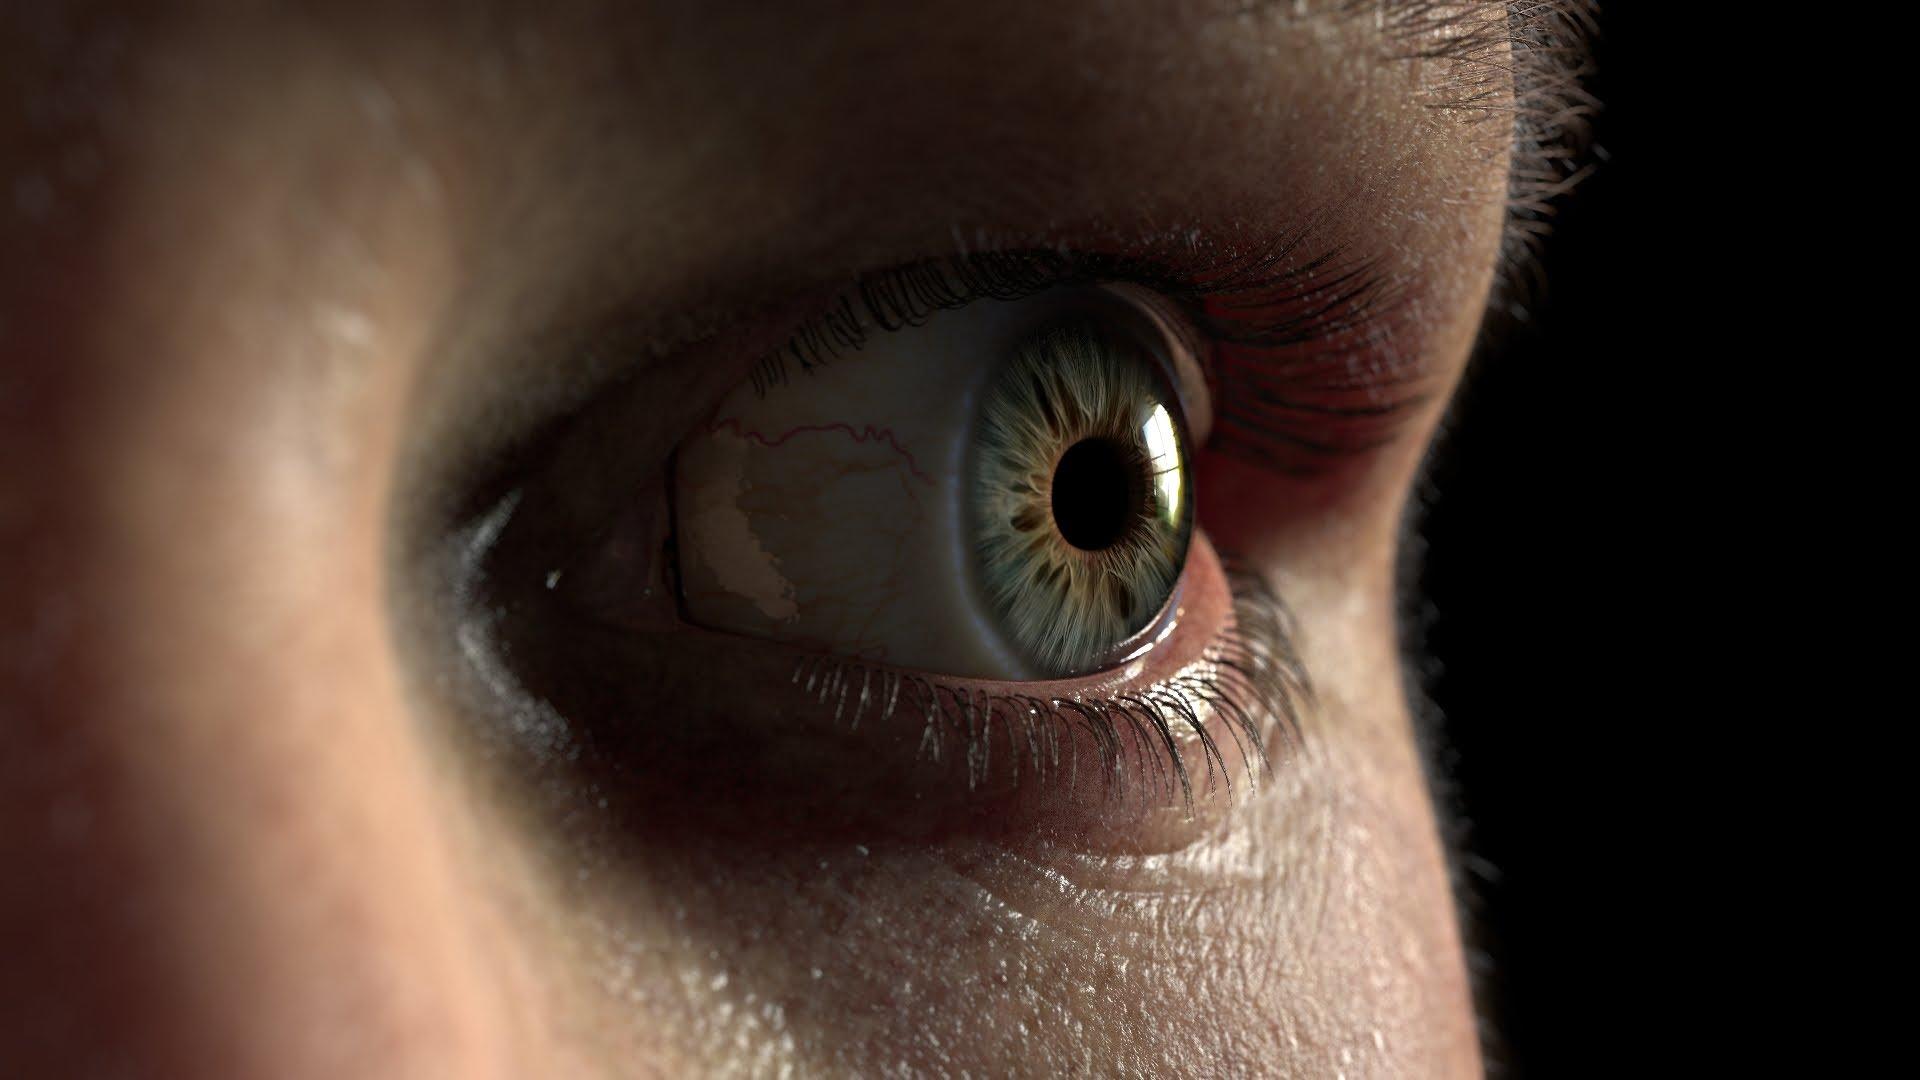 Eye Piece, A Short Video Featuring a Disturbingly Realistic Eyeball Made Using Computer Graphics